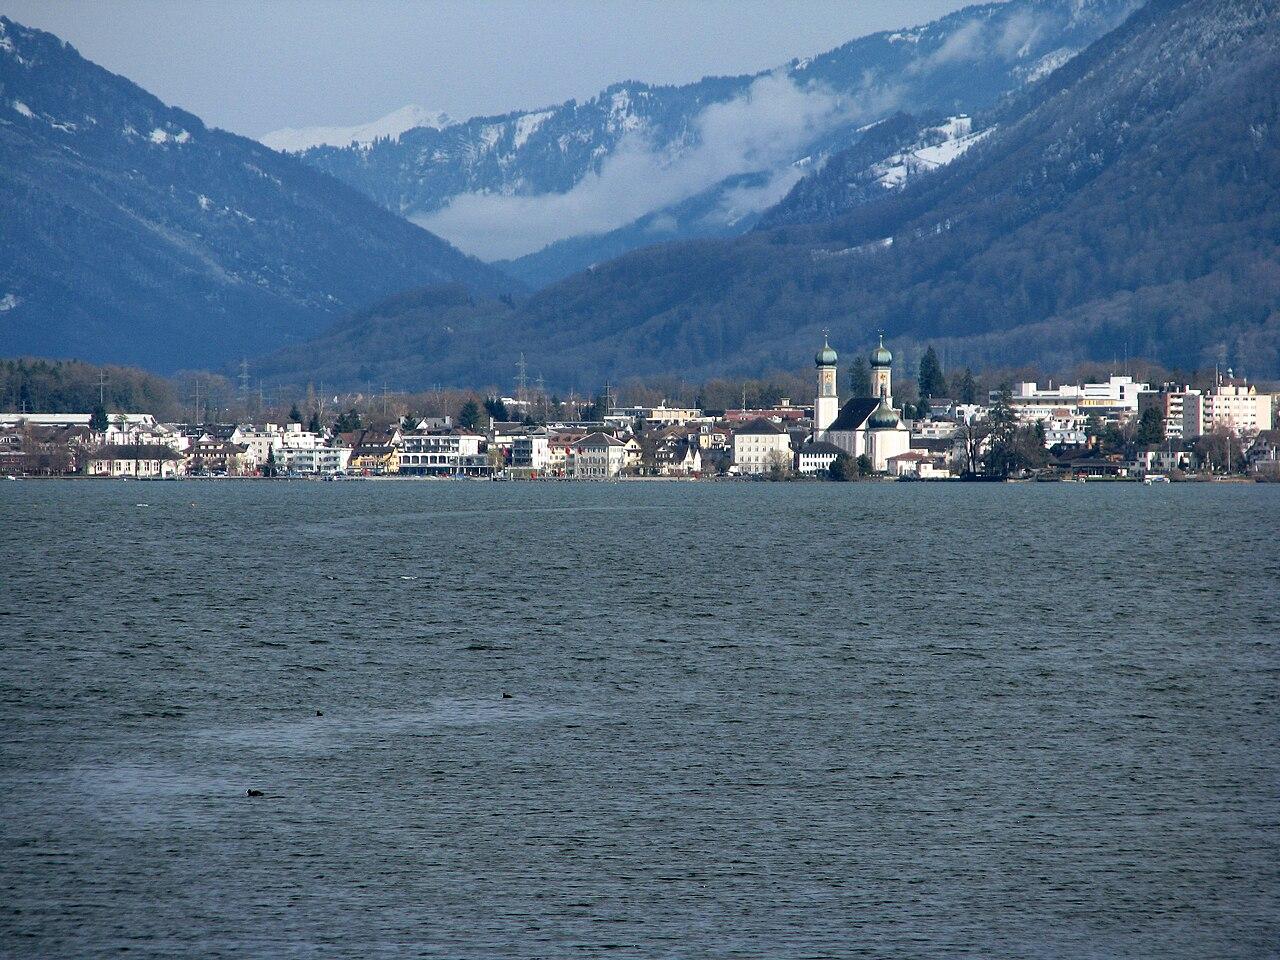 File:Lachen - Obersee - Hurden IMG 5214.JPG - Wikimedia Commons